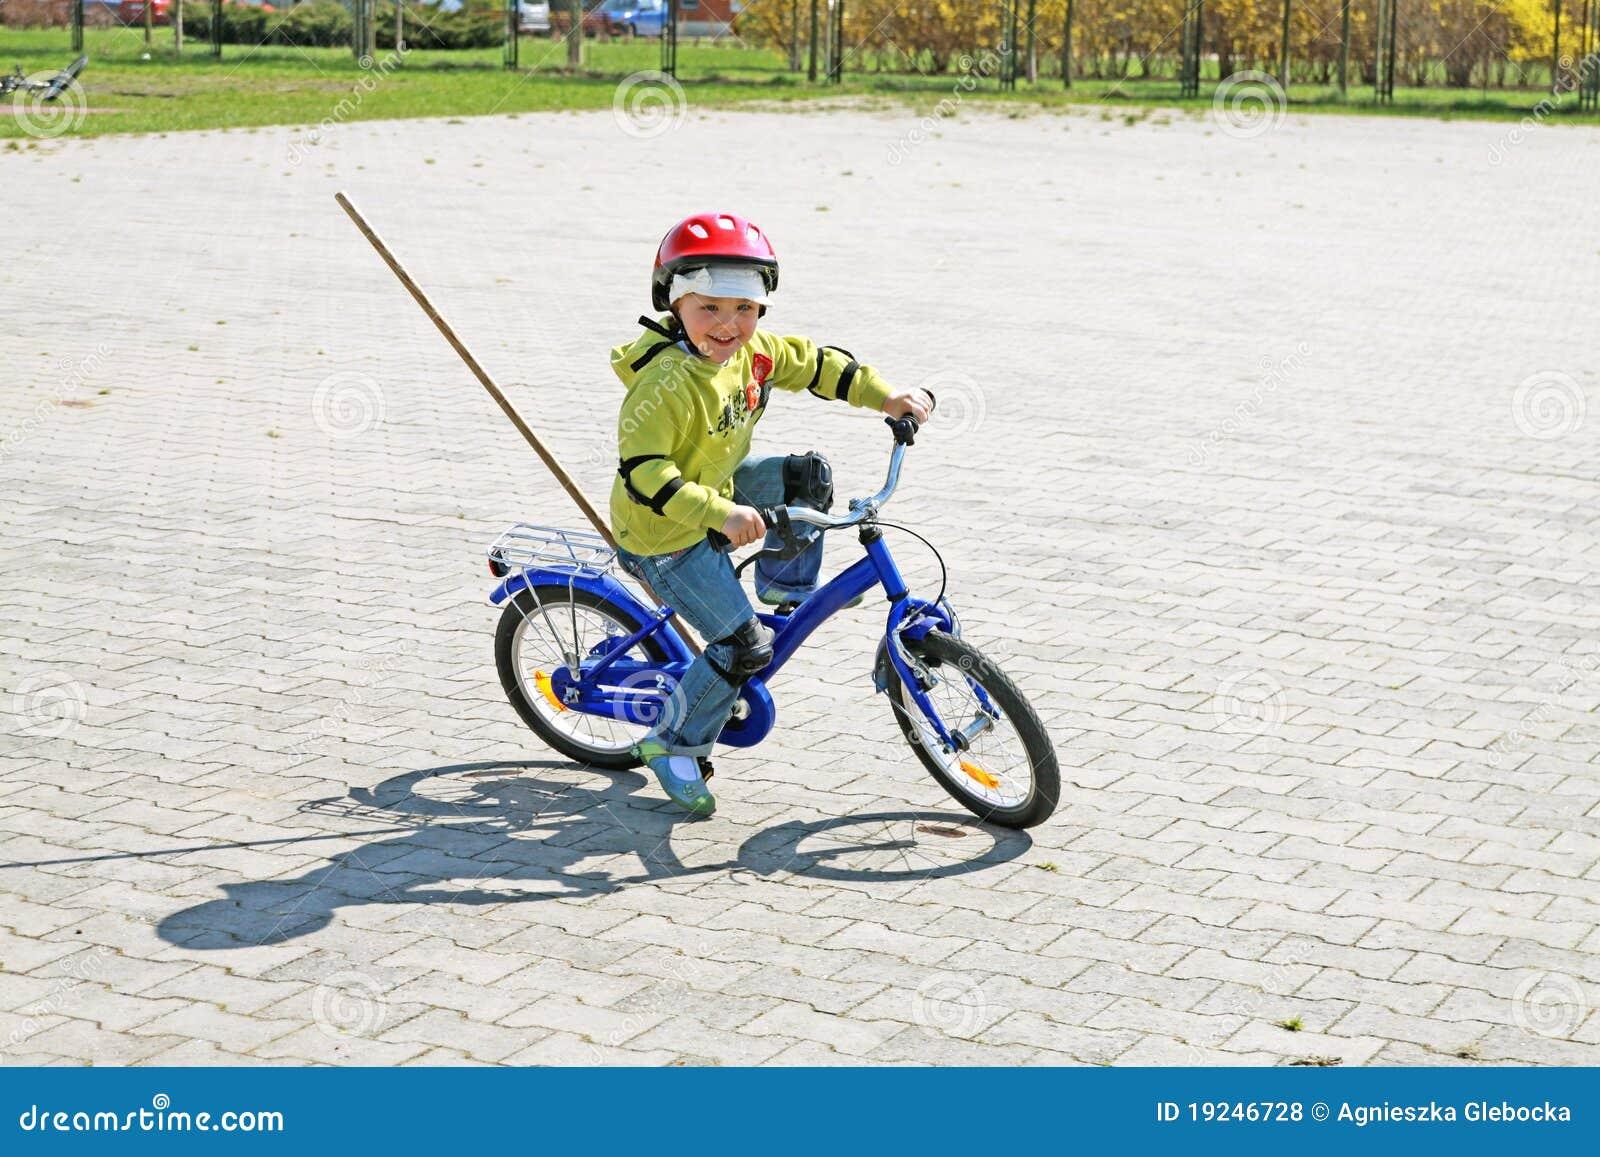 Kid Learns To Ride A Bike Video